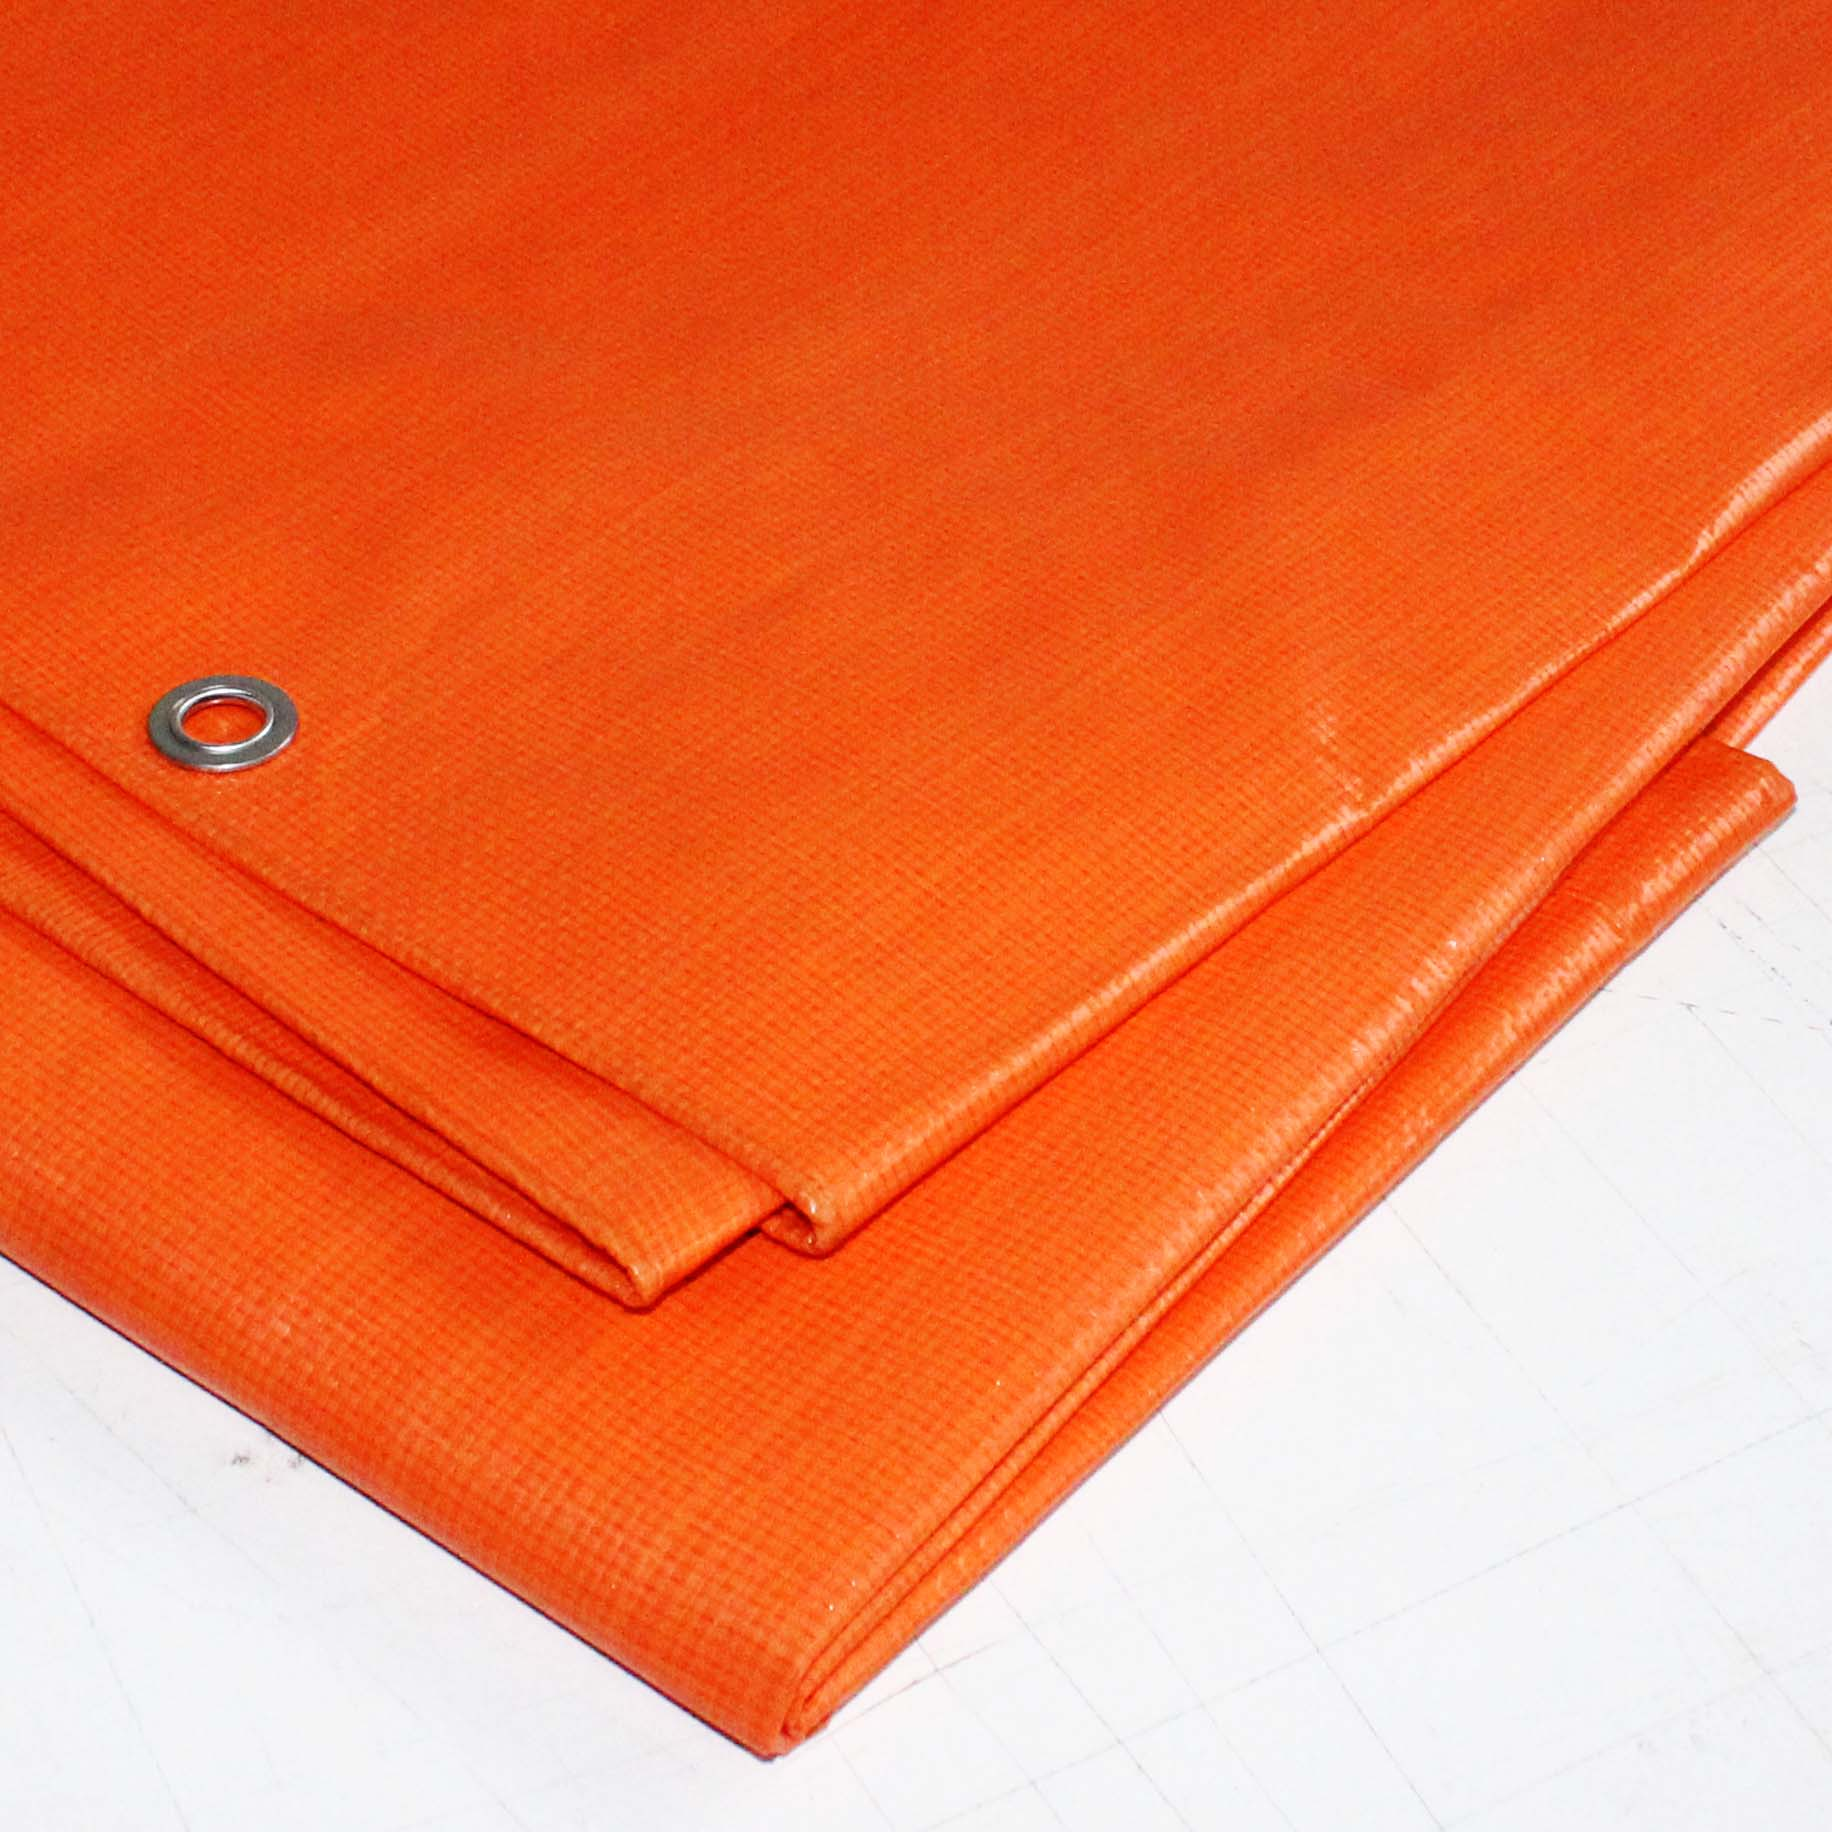 Prolona leve agric laranja 3x4m